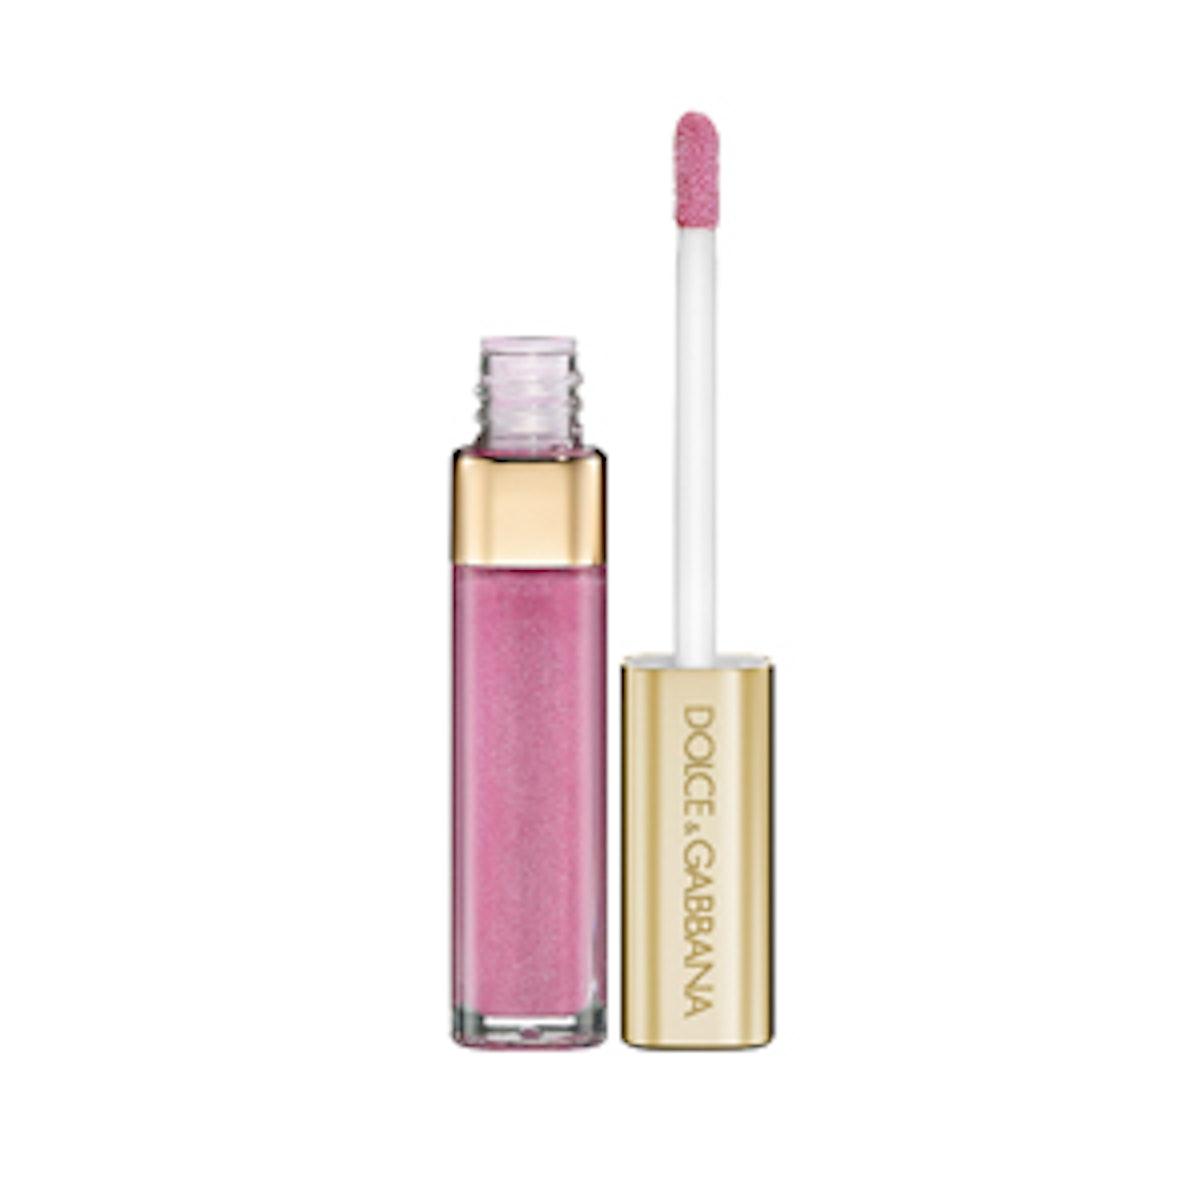 Ultra-Shine Lipgloss in Pink Sapphire